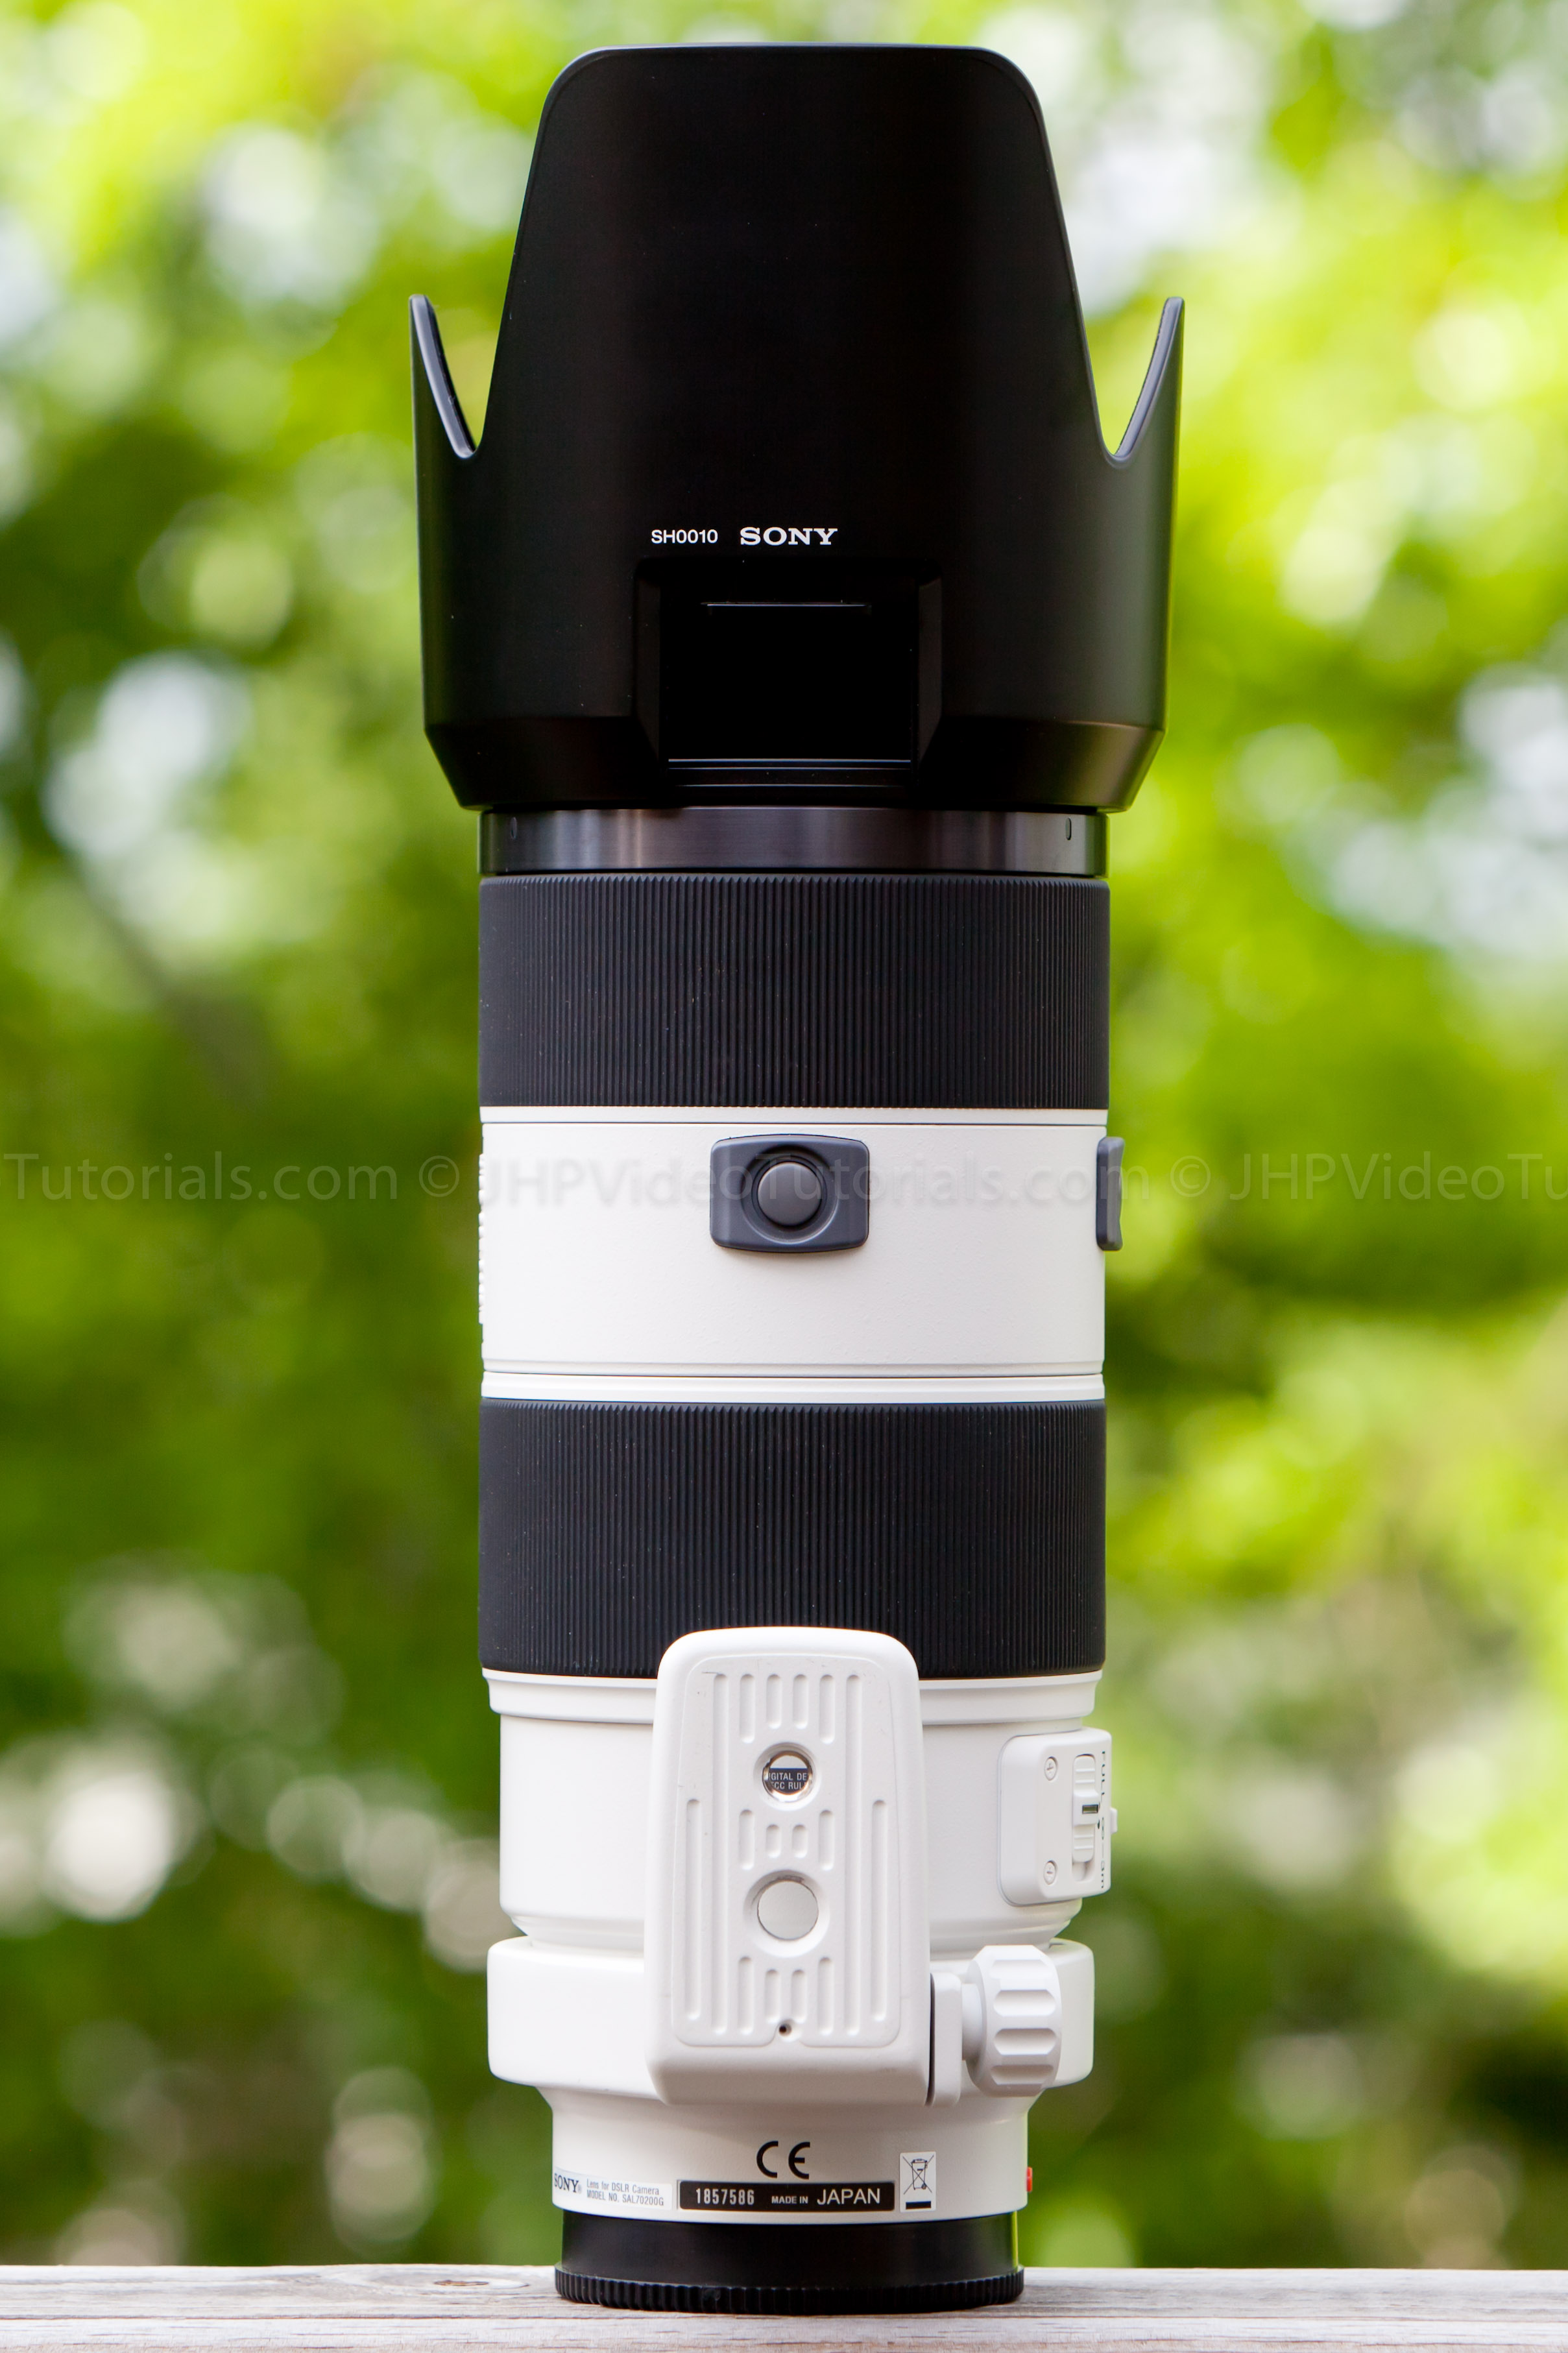 Sony 70-200mm f/2.8 APO G(D) SSM Lens